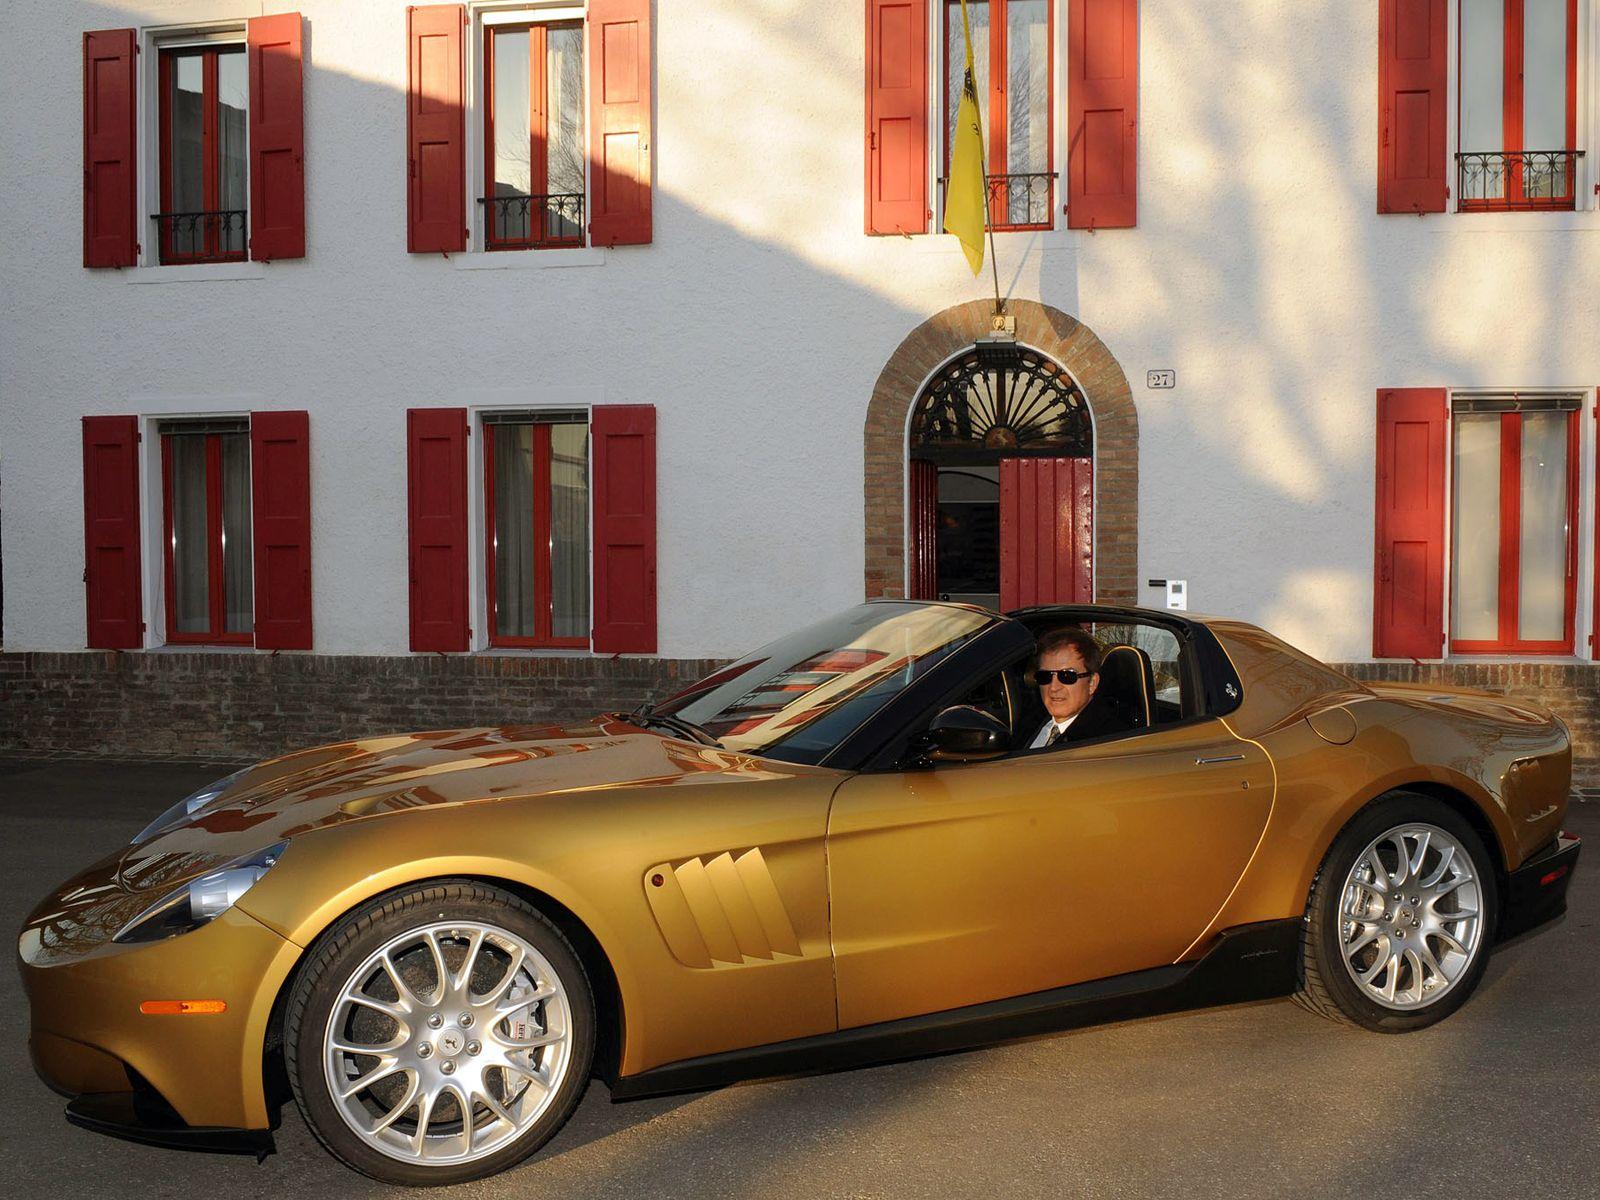 Ferrari P540 Superfast Aperta '2009